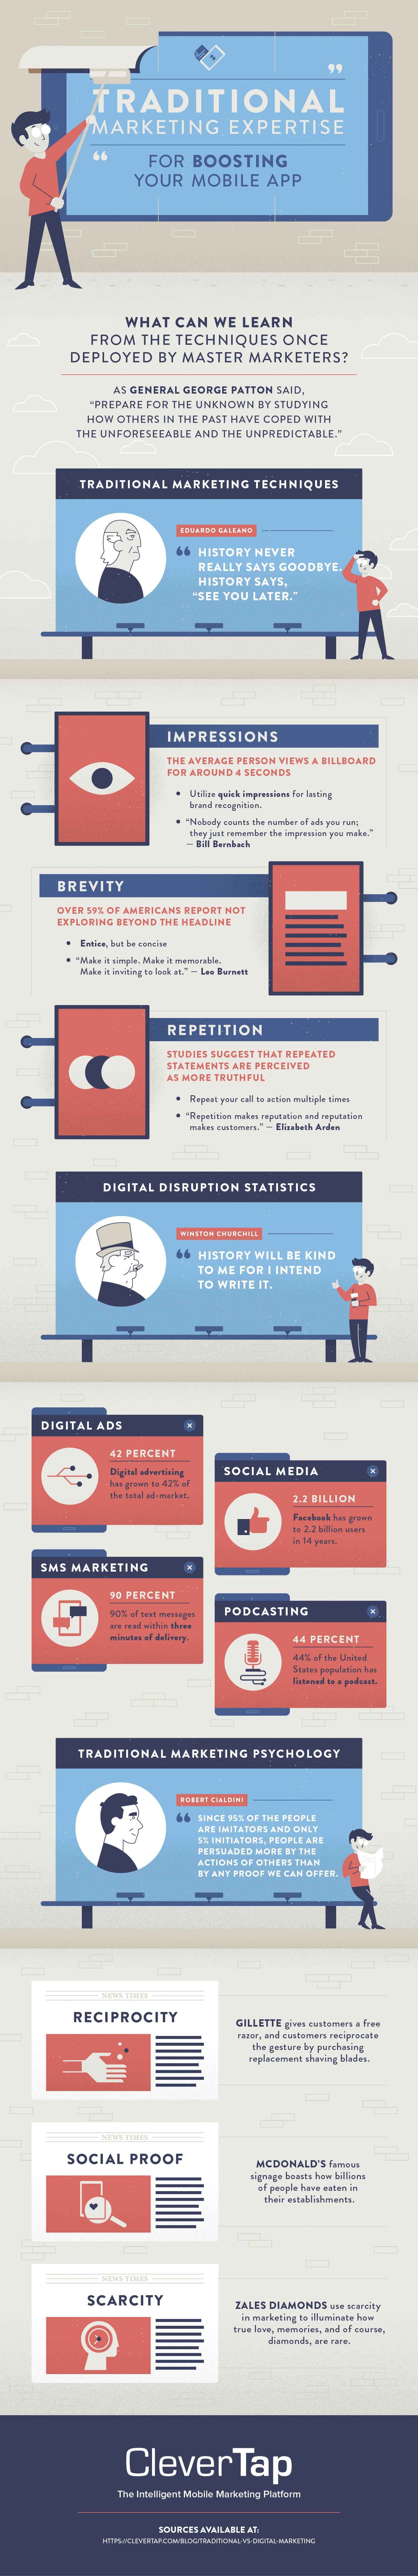 Traditional Marketing vs. Digital Marketing [Infographic]